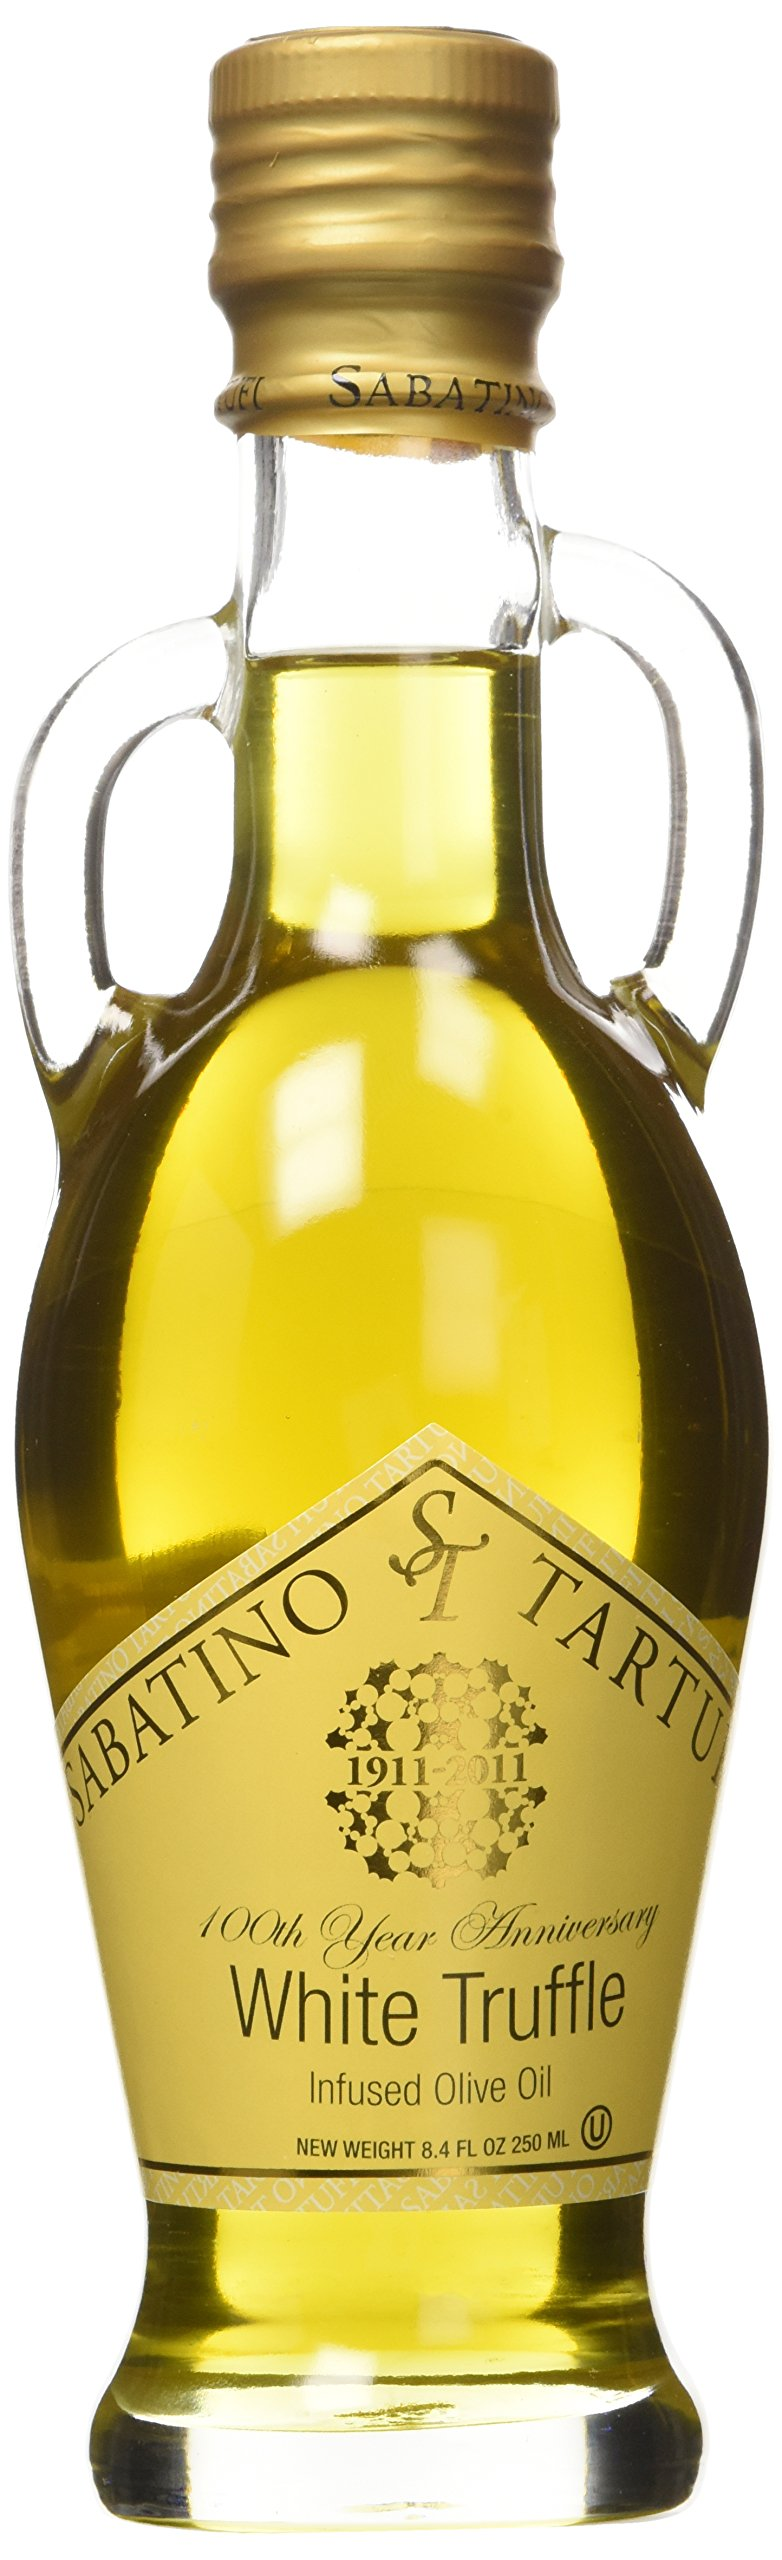 Sabatino White Truffle Olive Oil - 8.4 fl oz by Sabatino